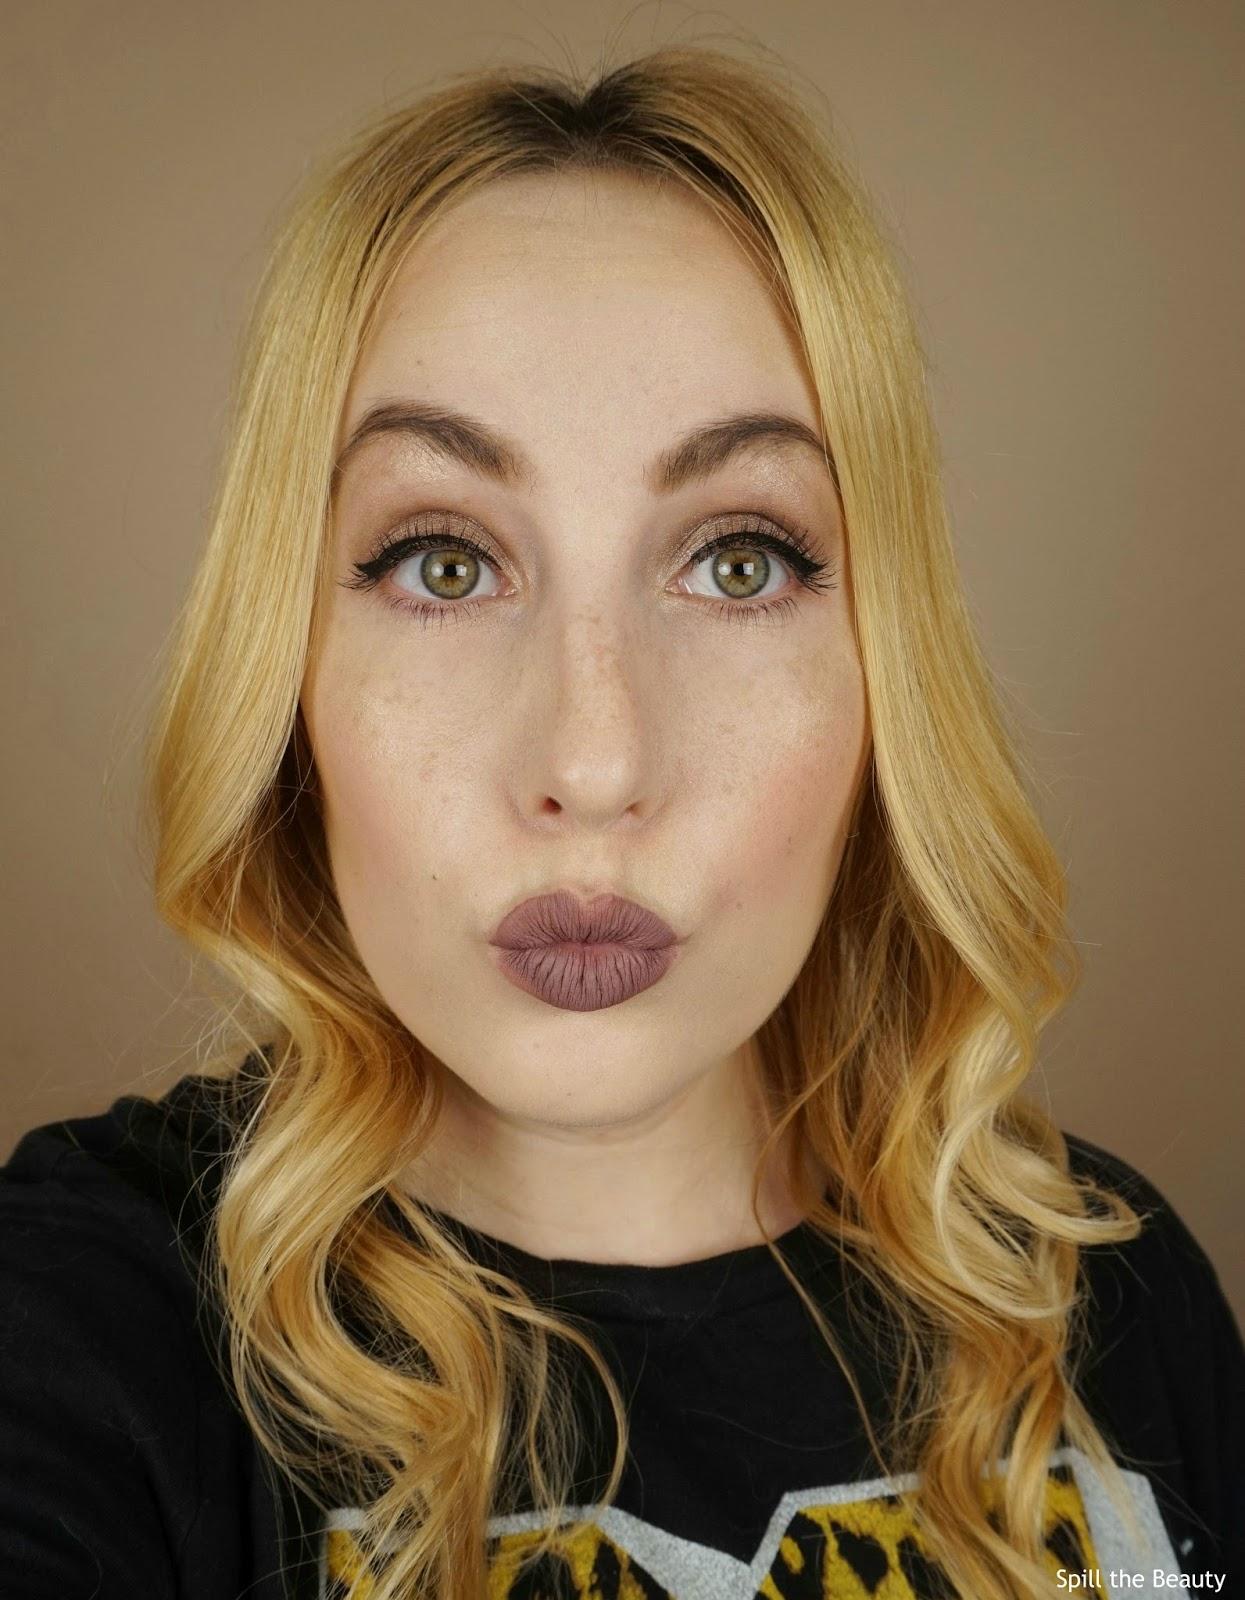 nyx lip lingirie embellishment review swatches comparison